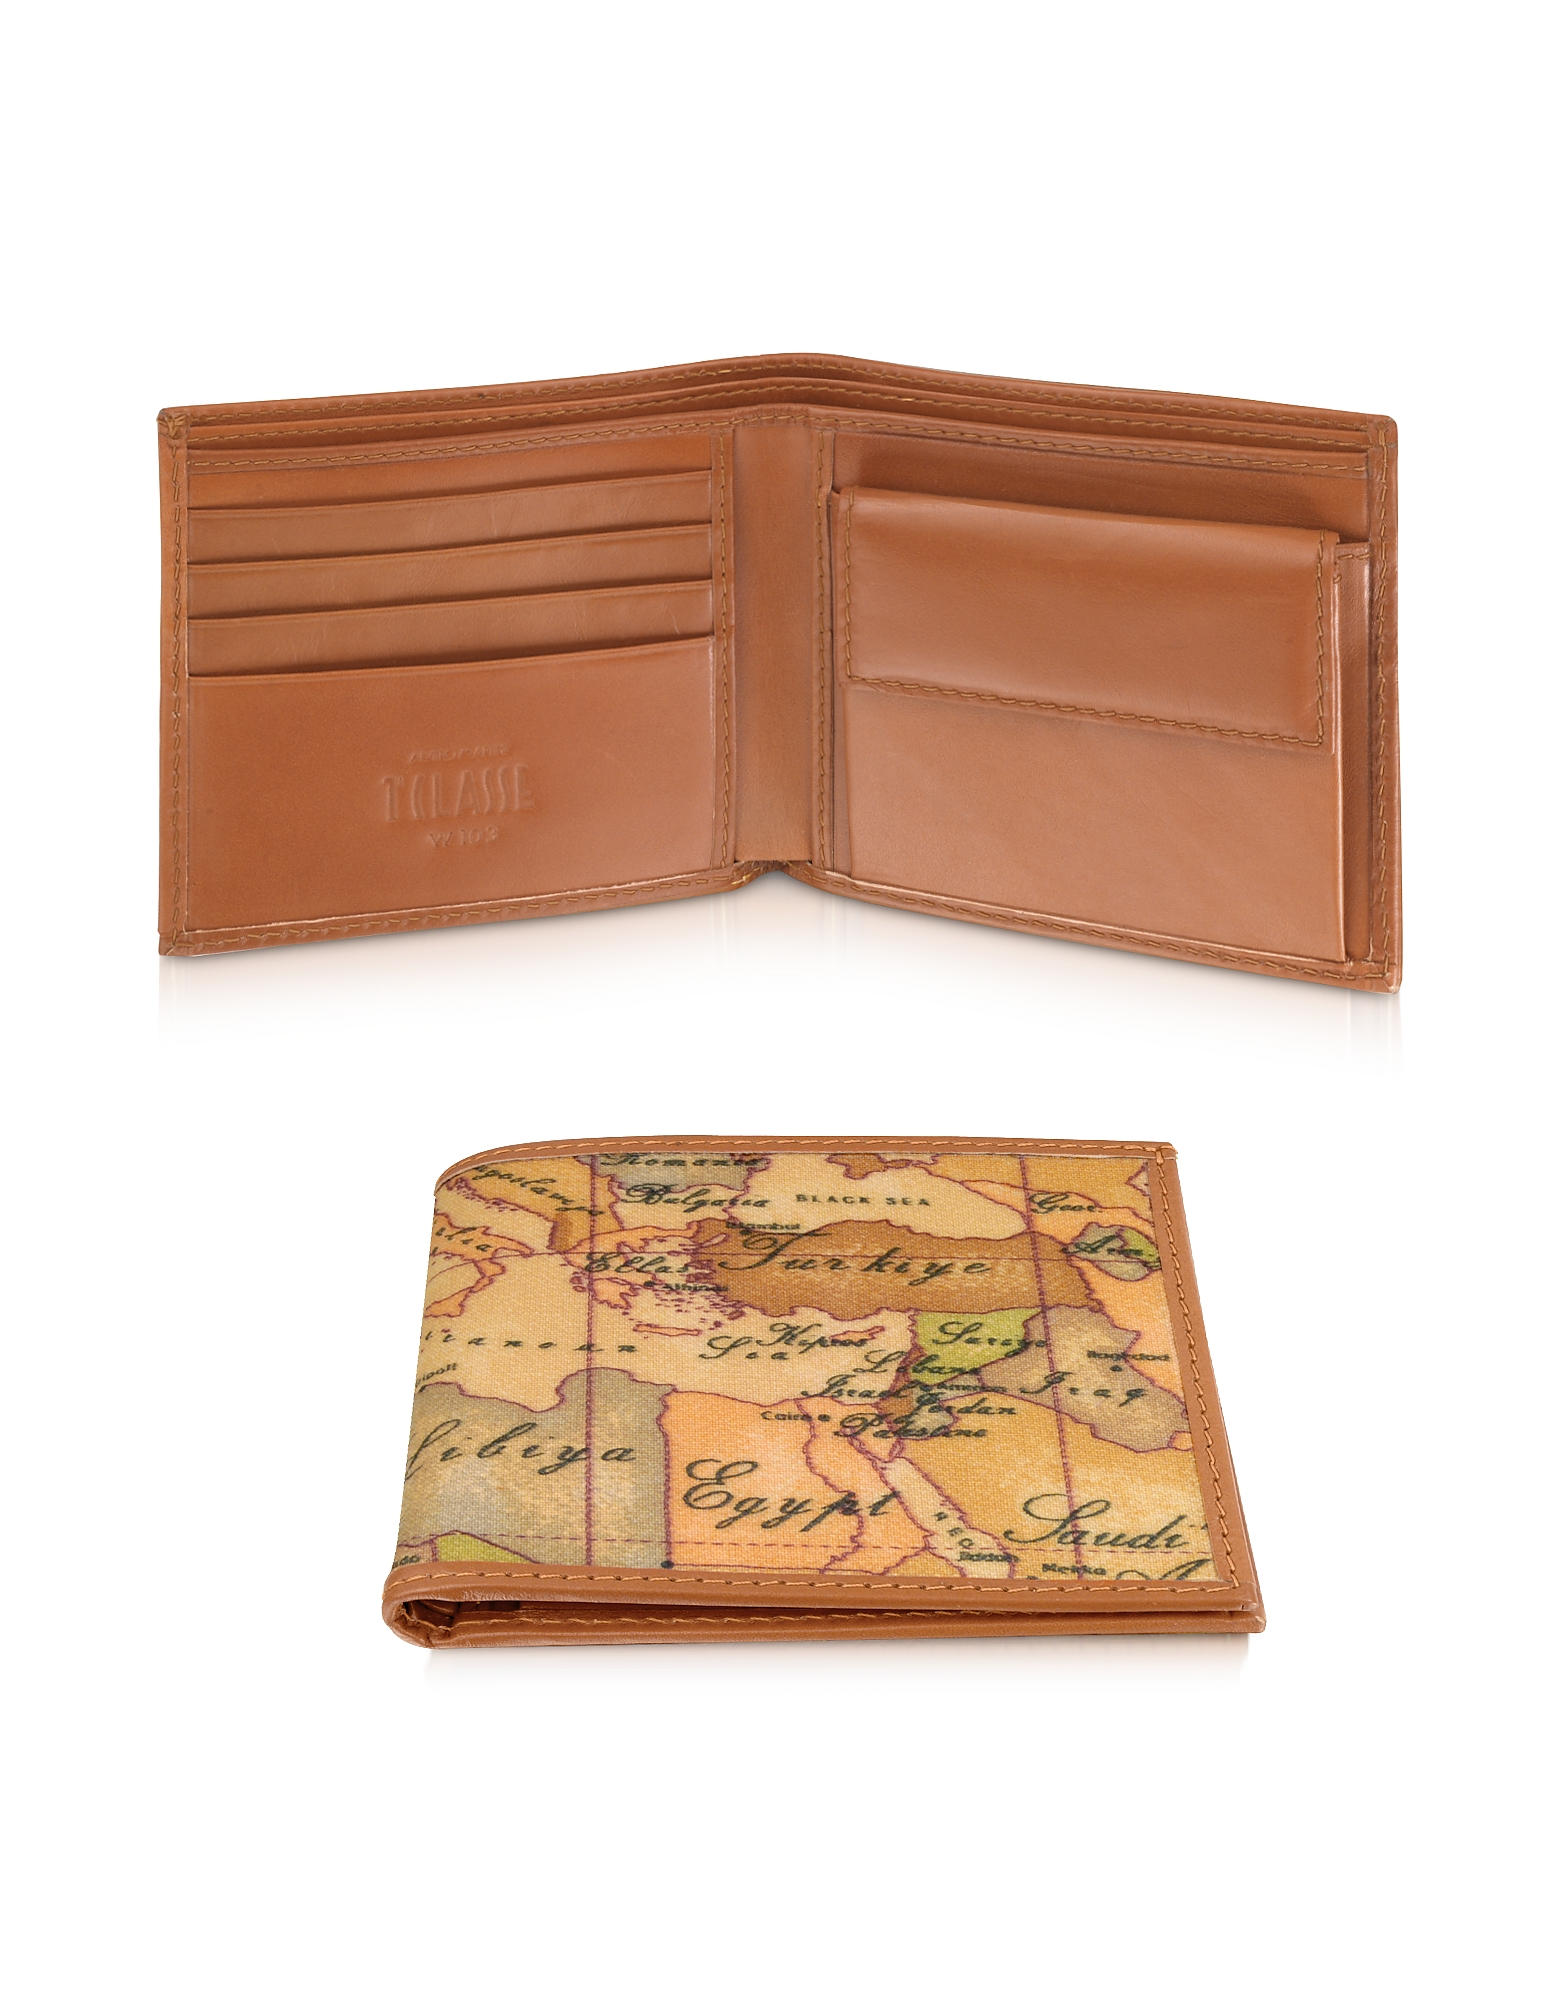 Image of Alviero Martini 1A Classe Designer Wallets, Geo Print Men's Wallet